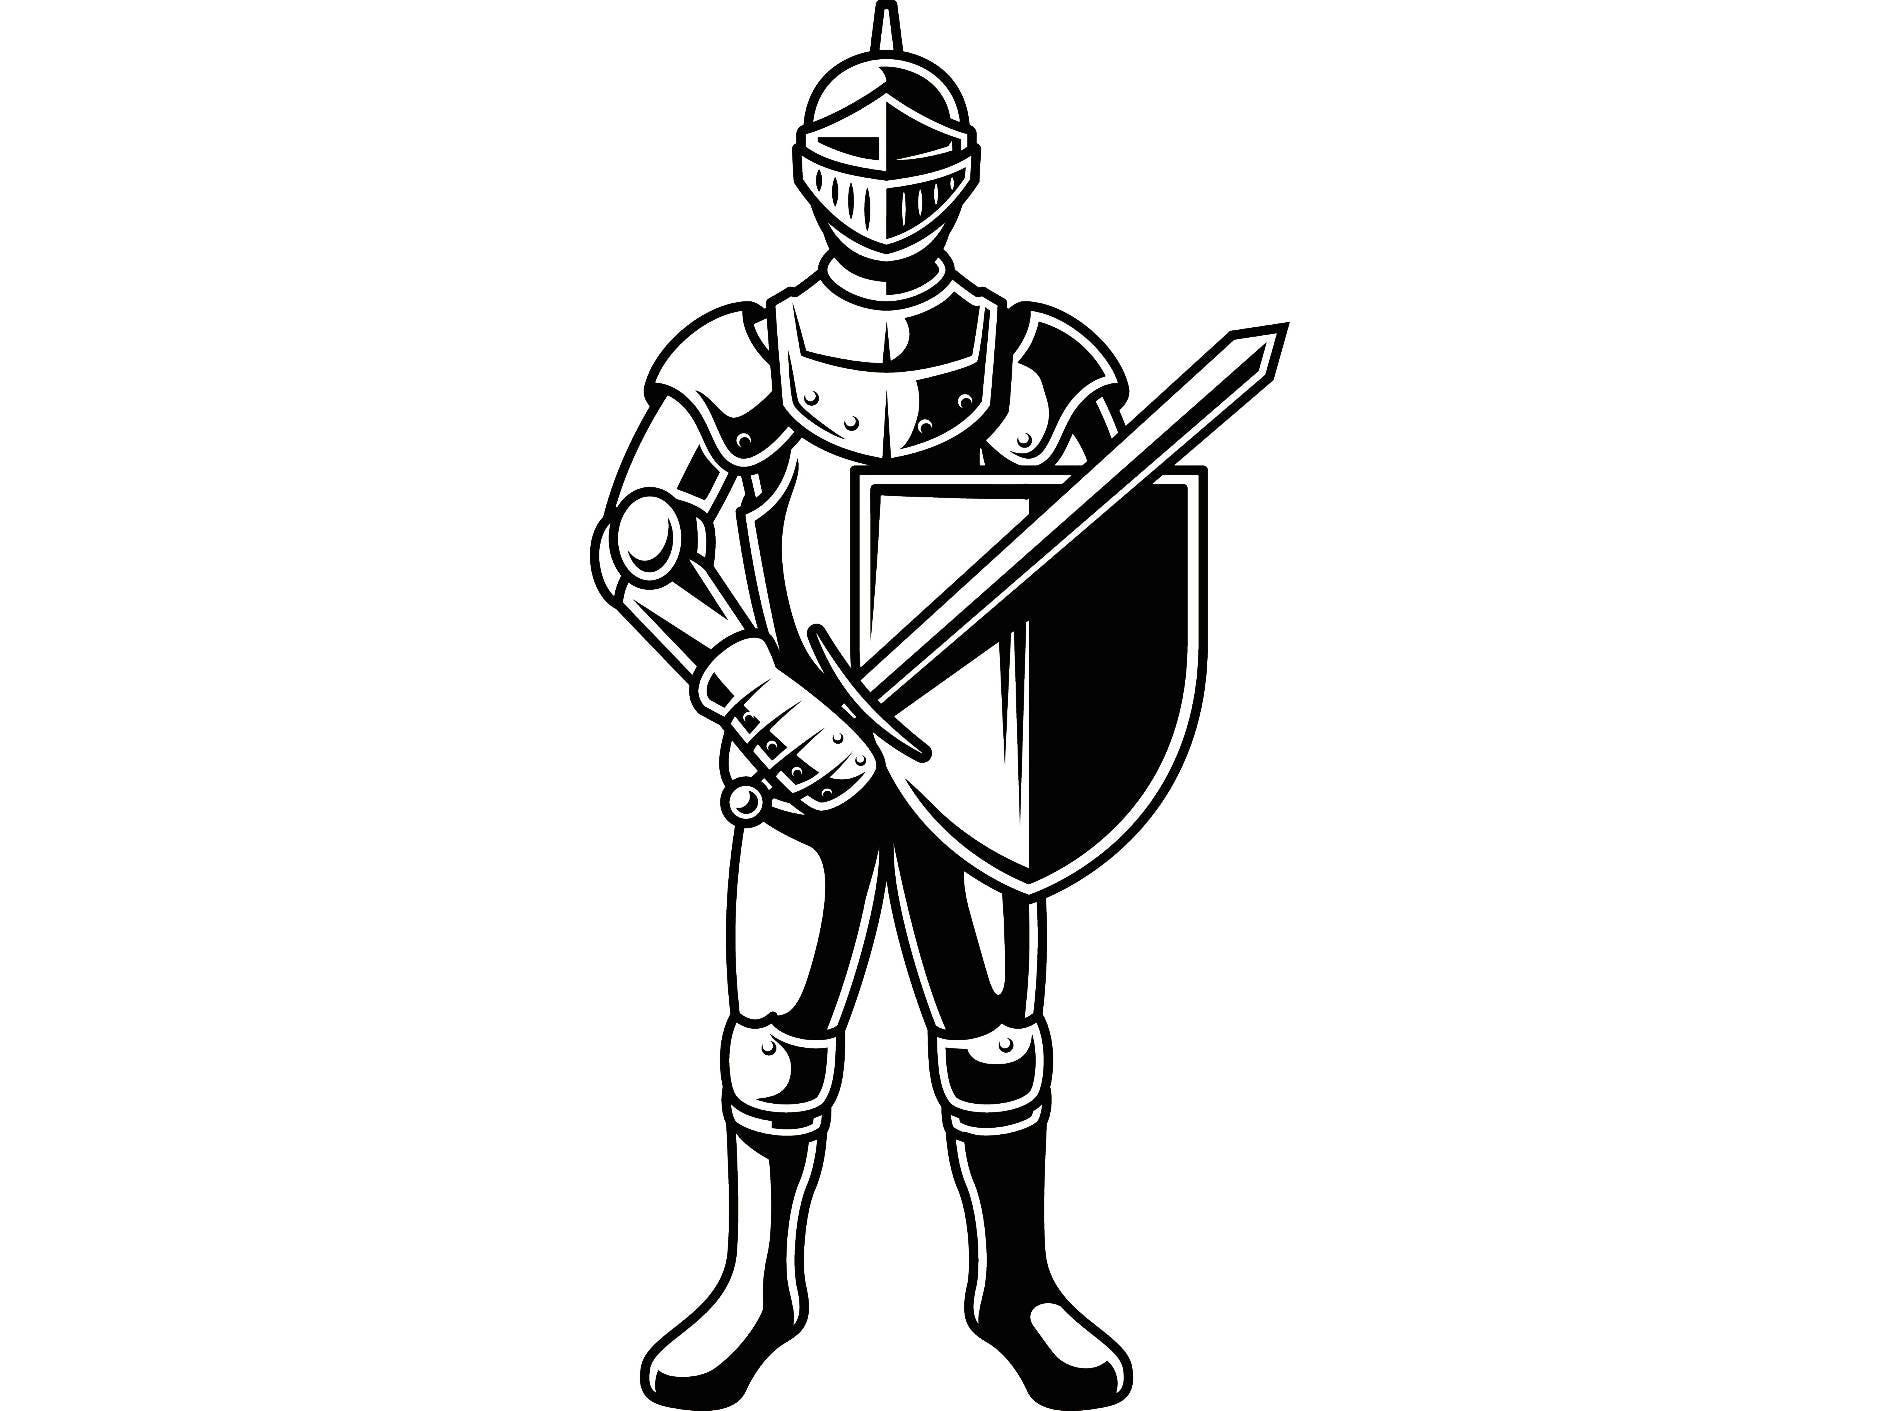 Knight 2 Metal Armor Helmet Sword Shield Monarch Military